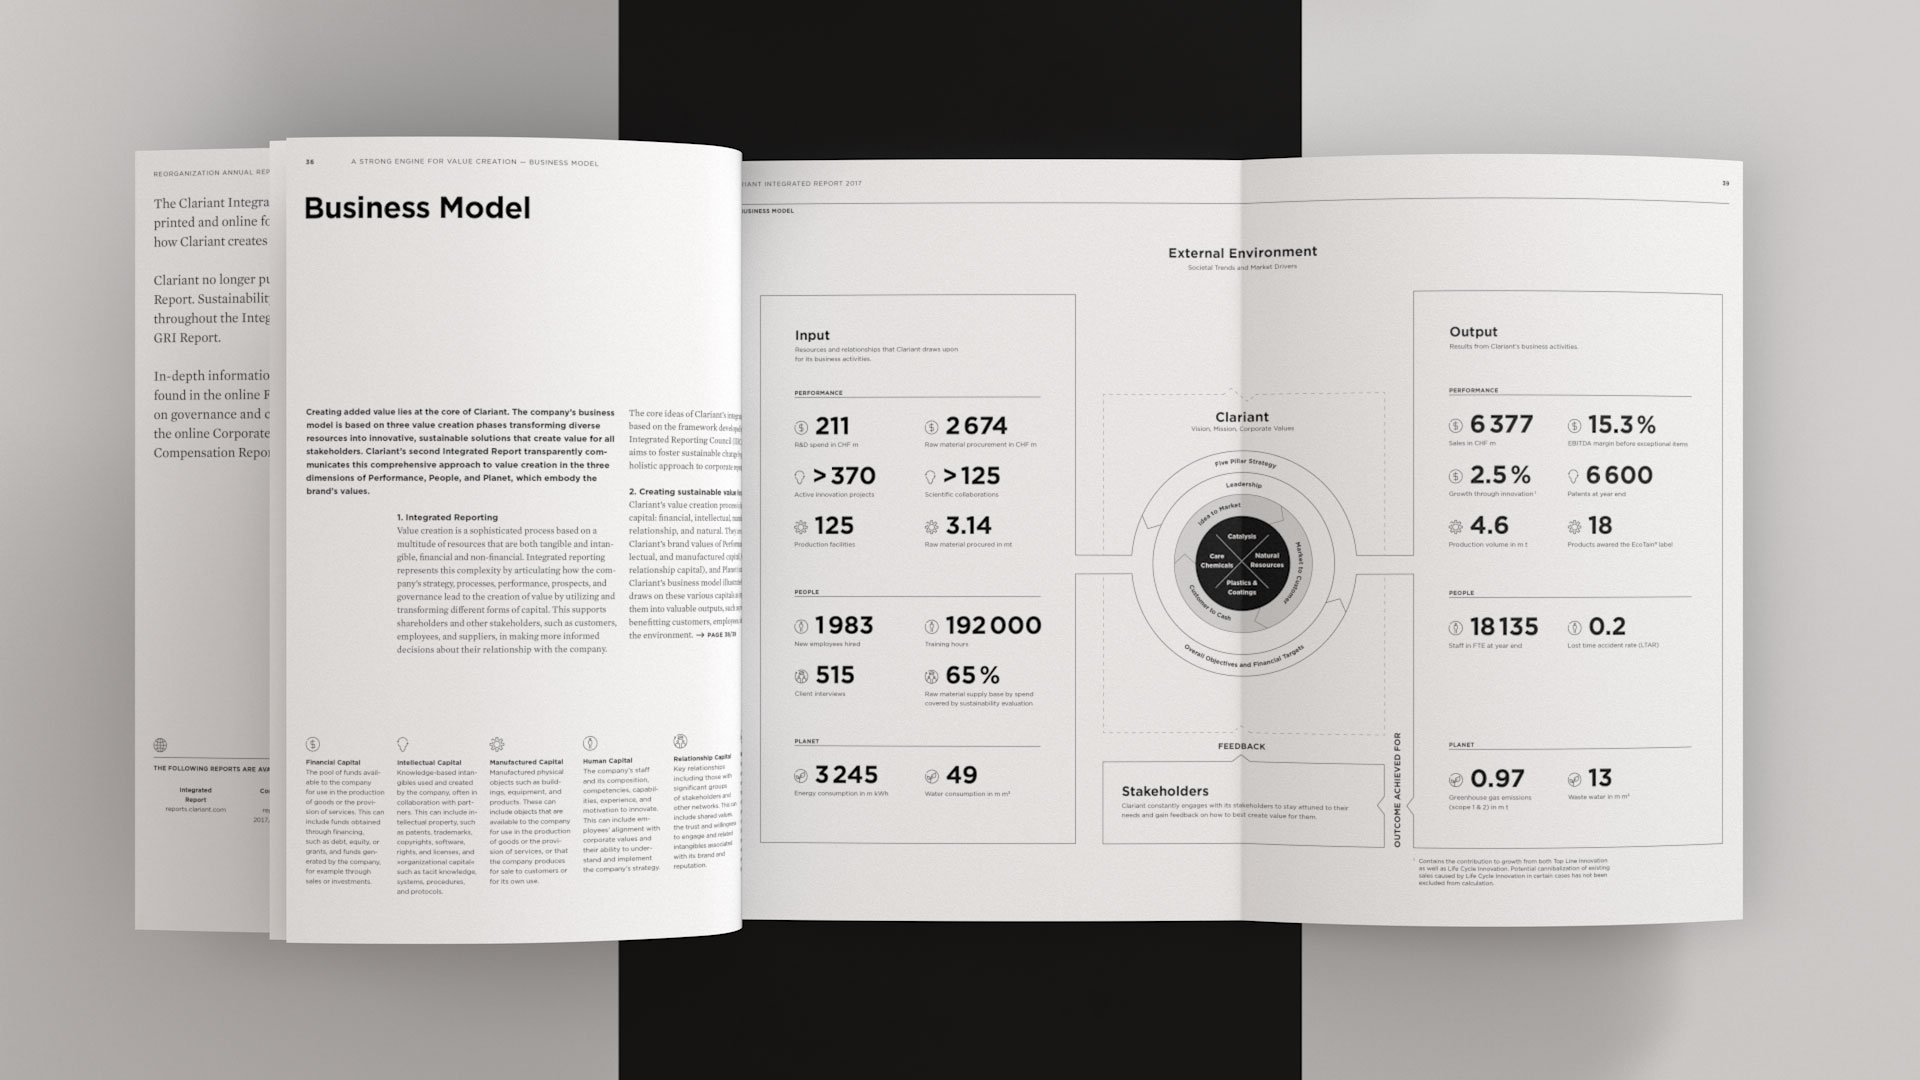 Clariant Integrierter Bericht 2017 Geschäftsmodell